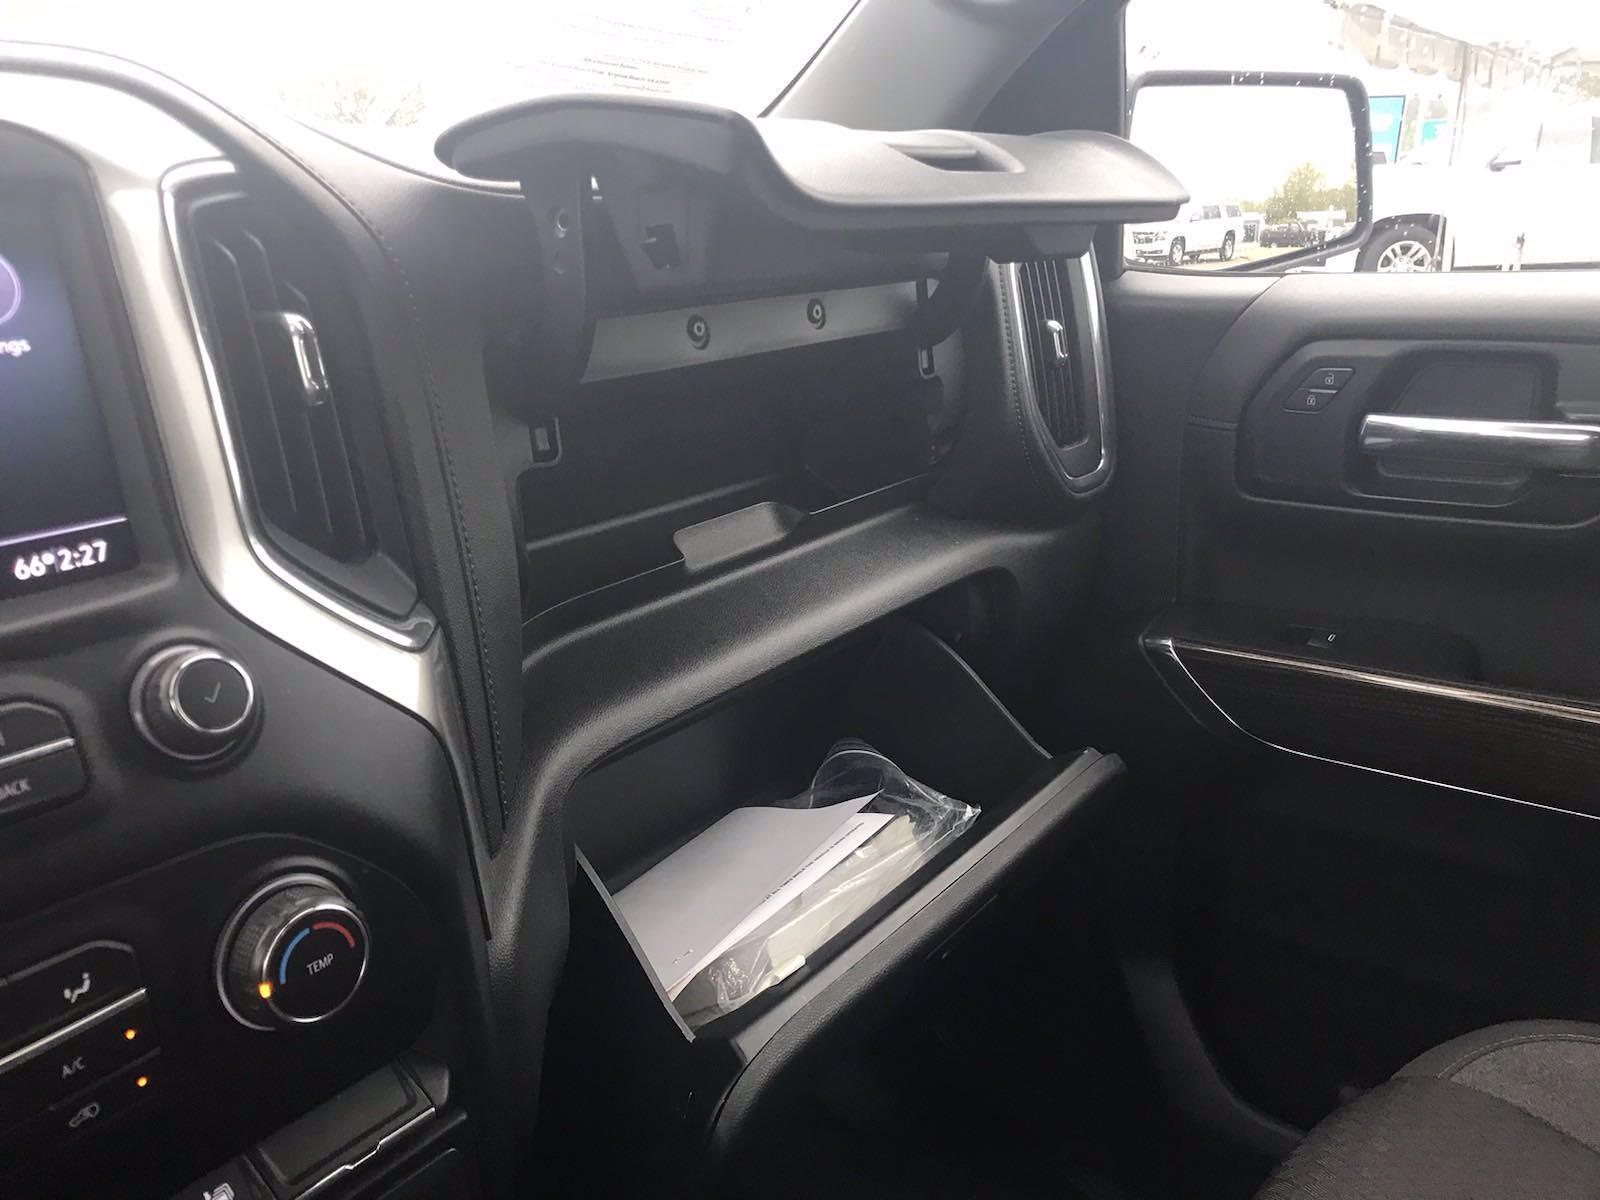 2020 Chevrolet Silverado 1500 Crew Cab 4x2, Pickup #16480P - photo 35